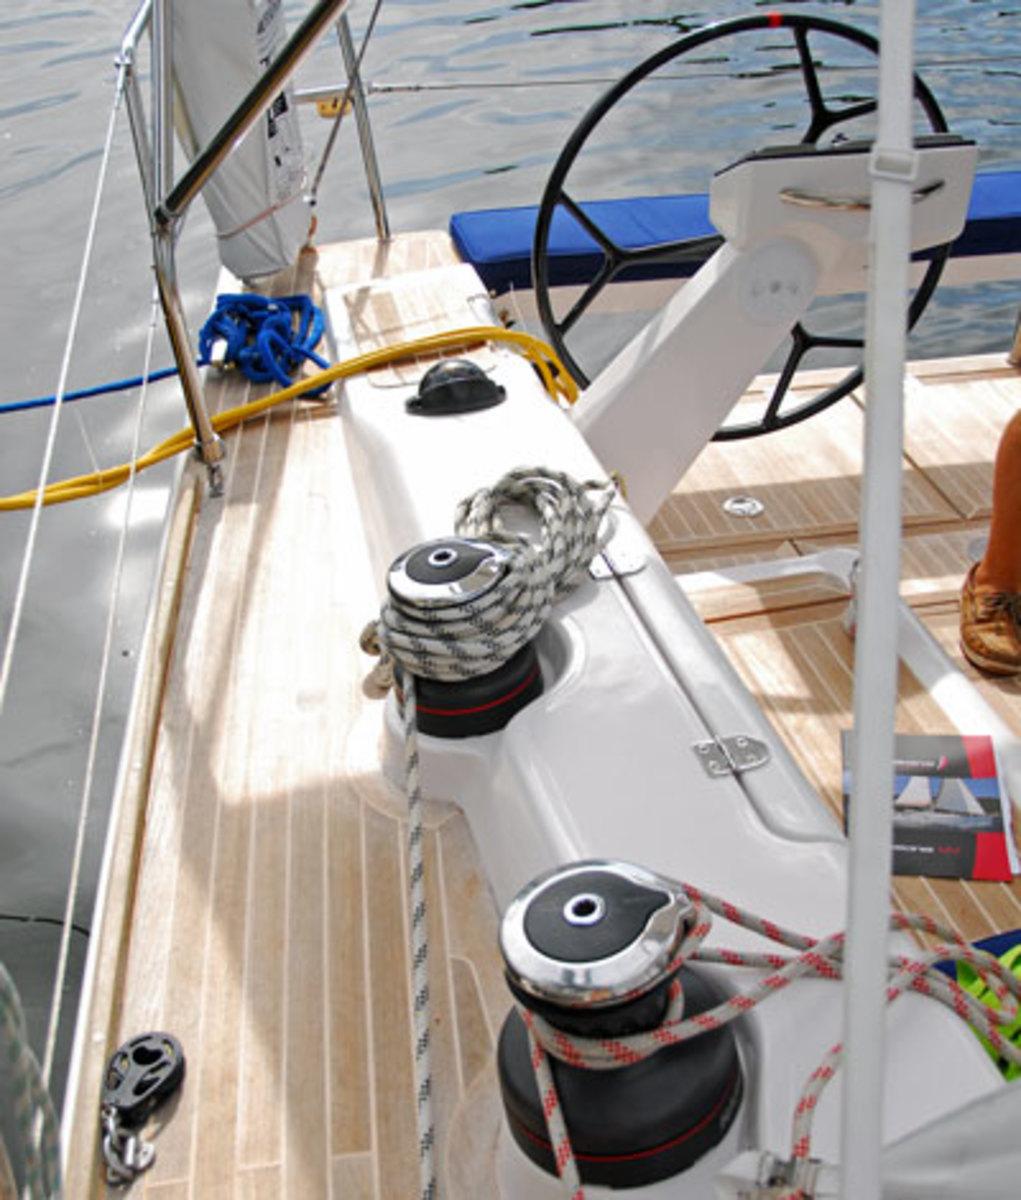 Clean deck layout